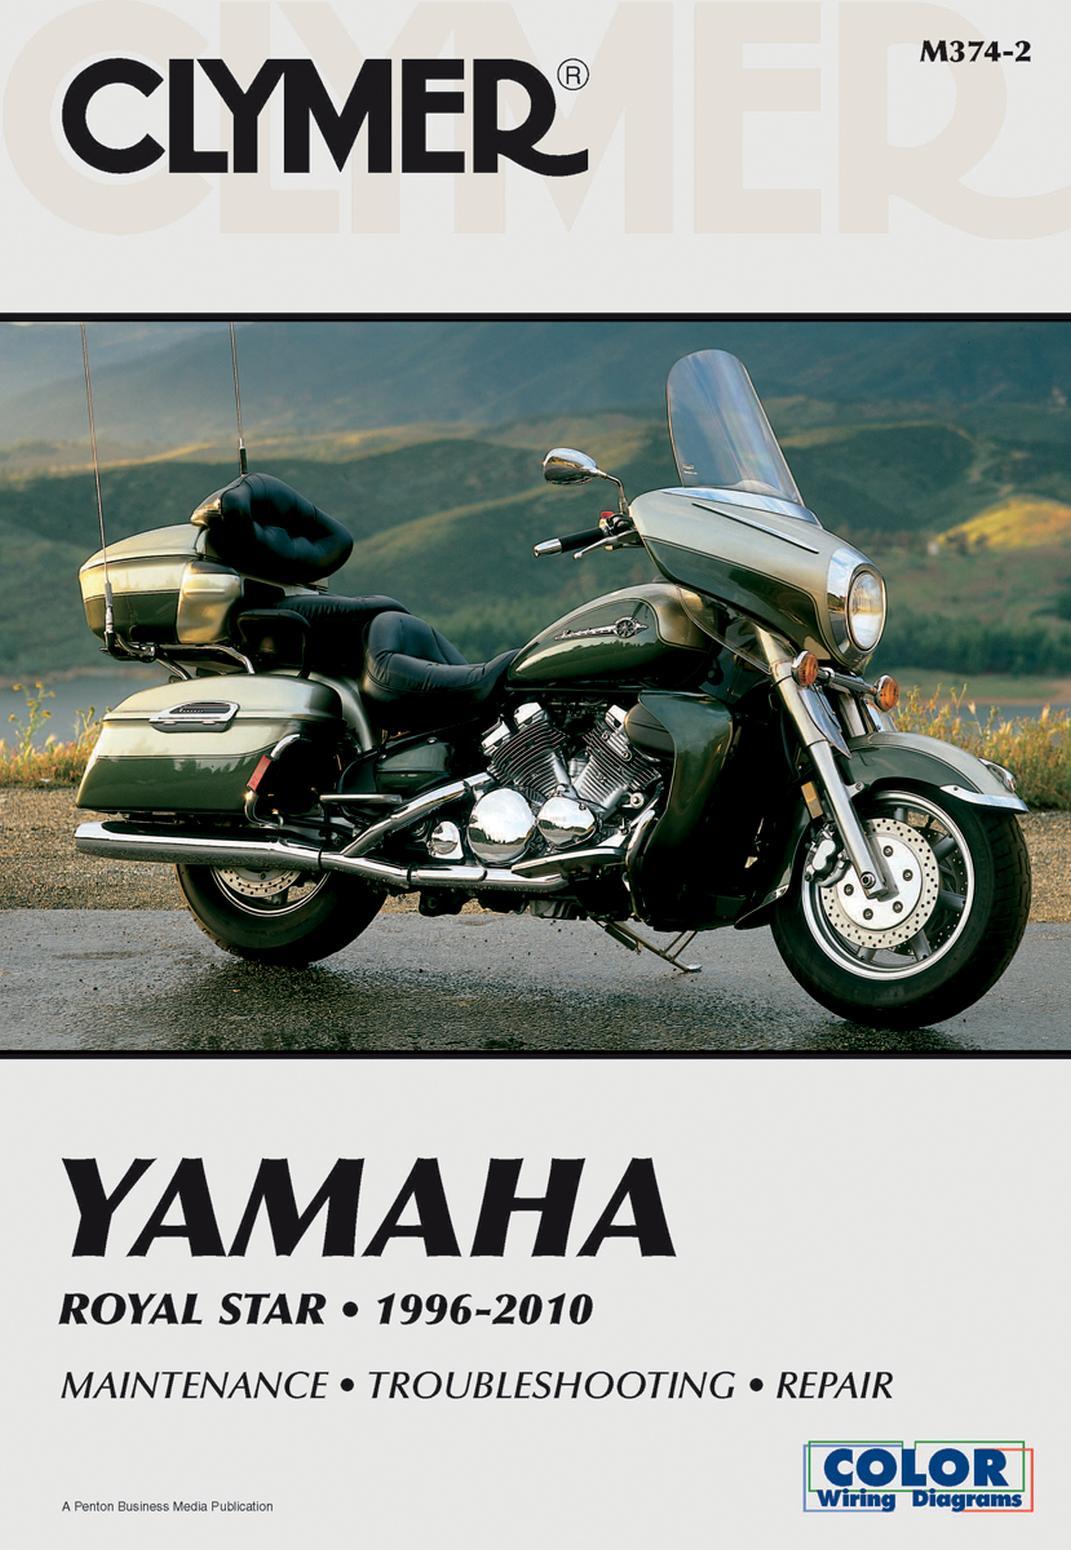 cly42010036 100 [ yamaha venture xvz shop manual ] 1200 venture royale Vulcan 750 Wiring Diagram at readyjetset.co